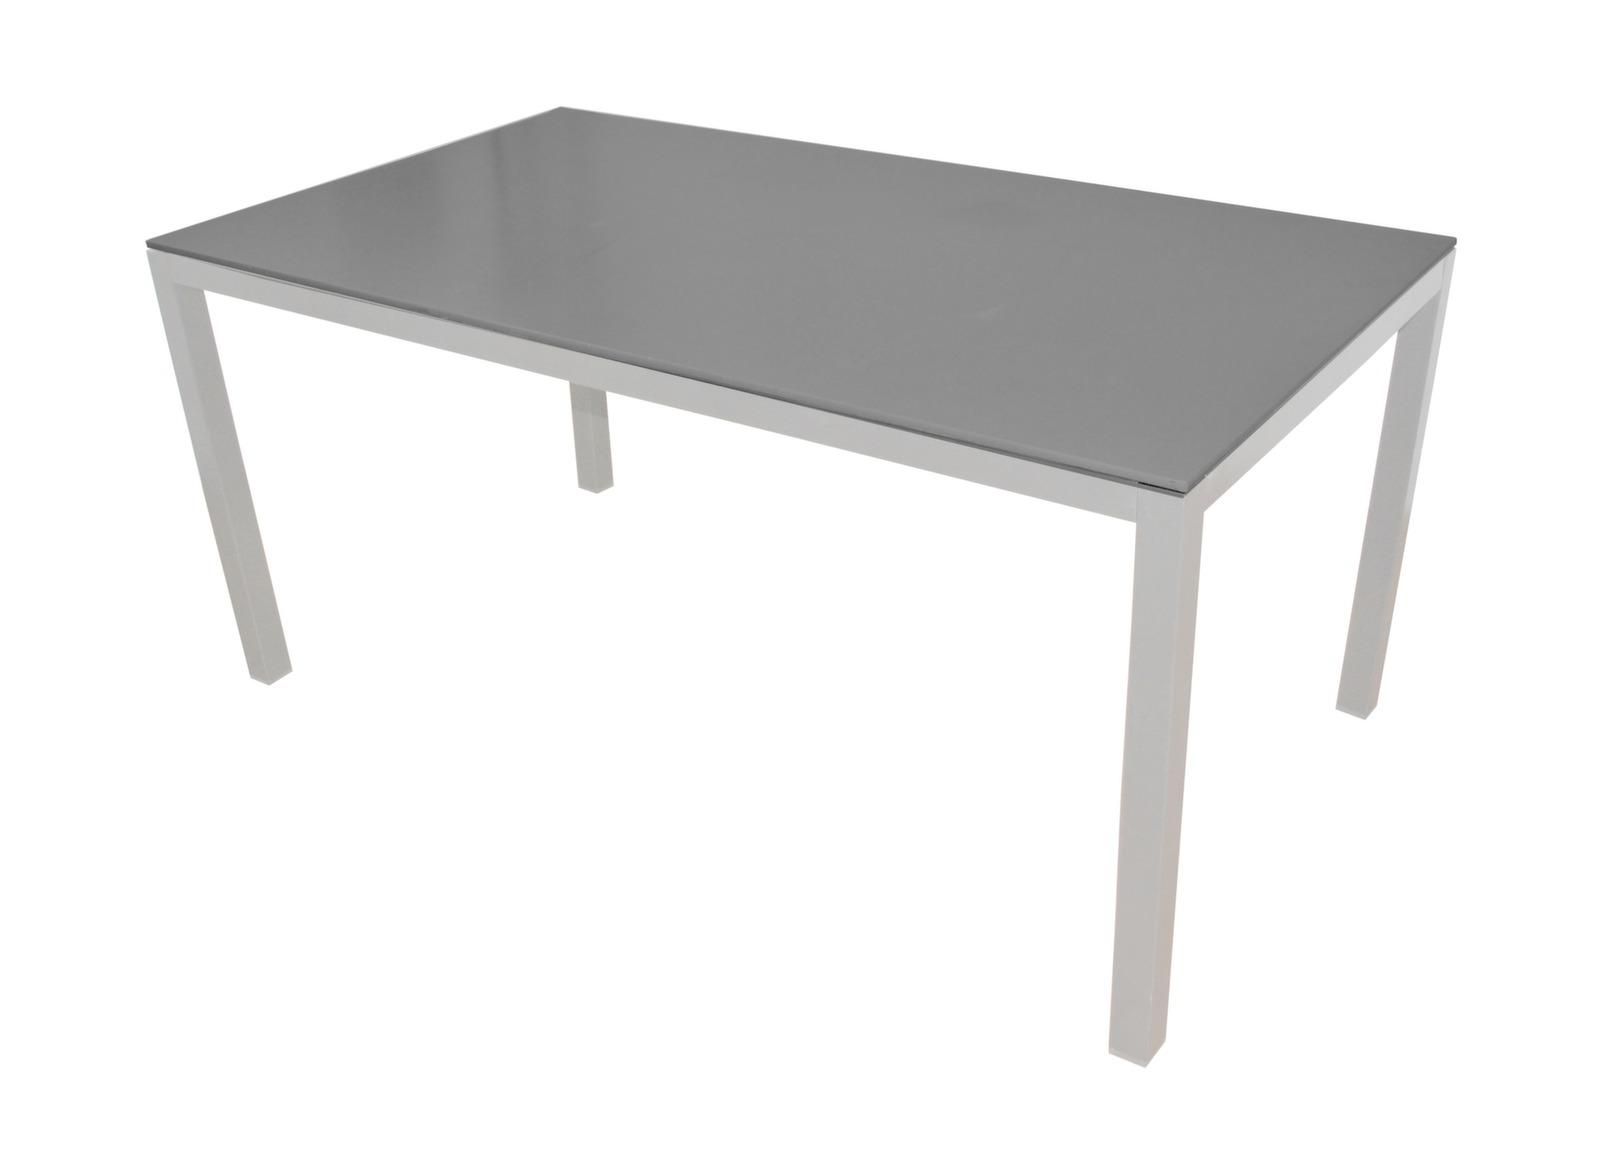 table de jardin cr ation 200x100cm 6 chaises promo proloisirs. Black Bedroom Furniture Sets. Home Design Ideas